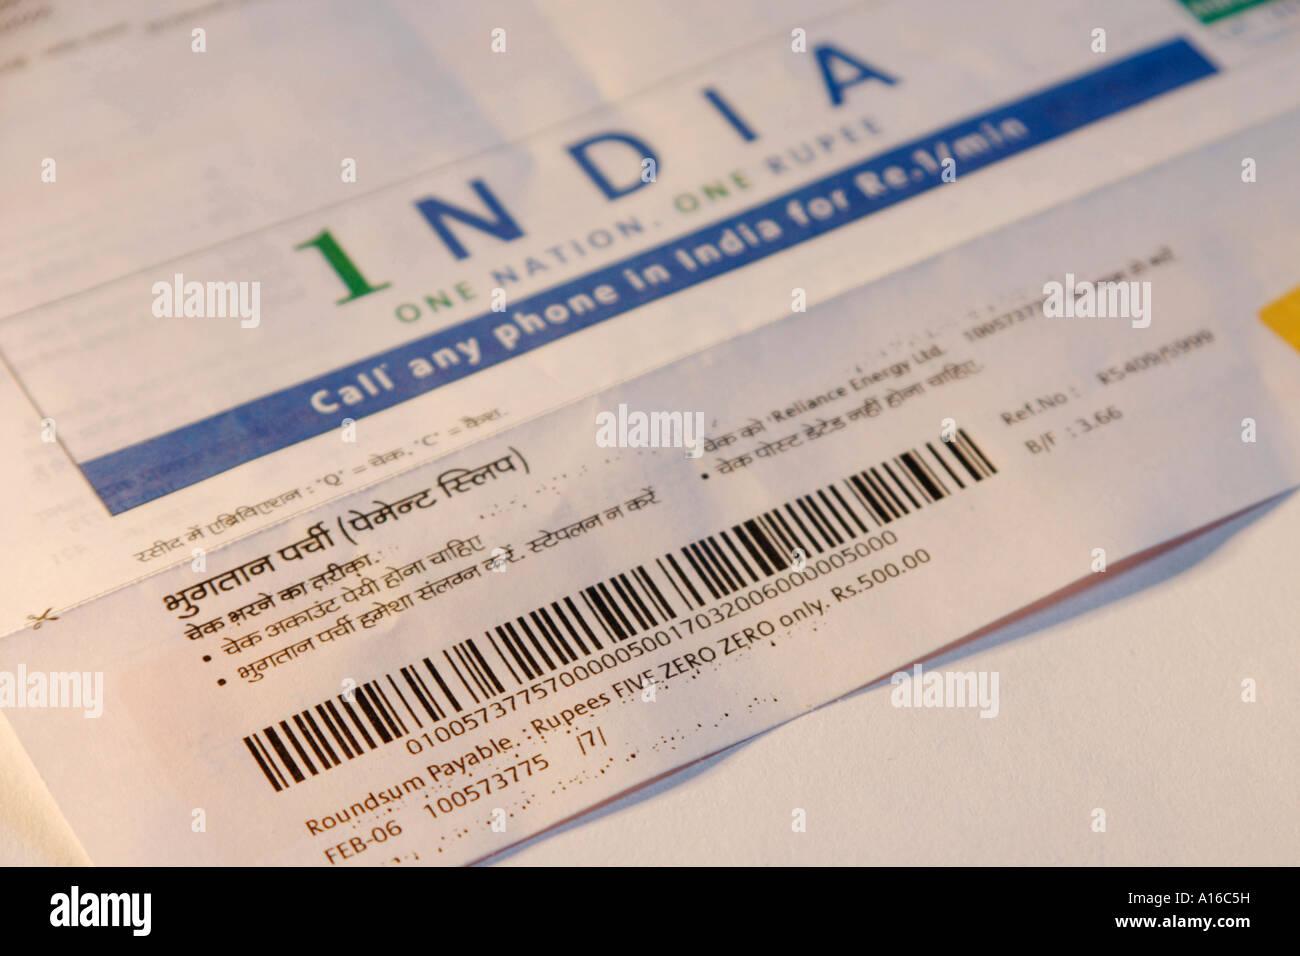 vhm102389 payment slip of electric bill of reliance energy urban living bar code bombay now mumbai maharashtra india